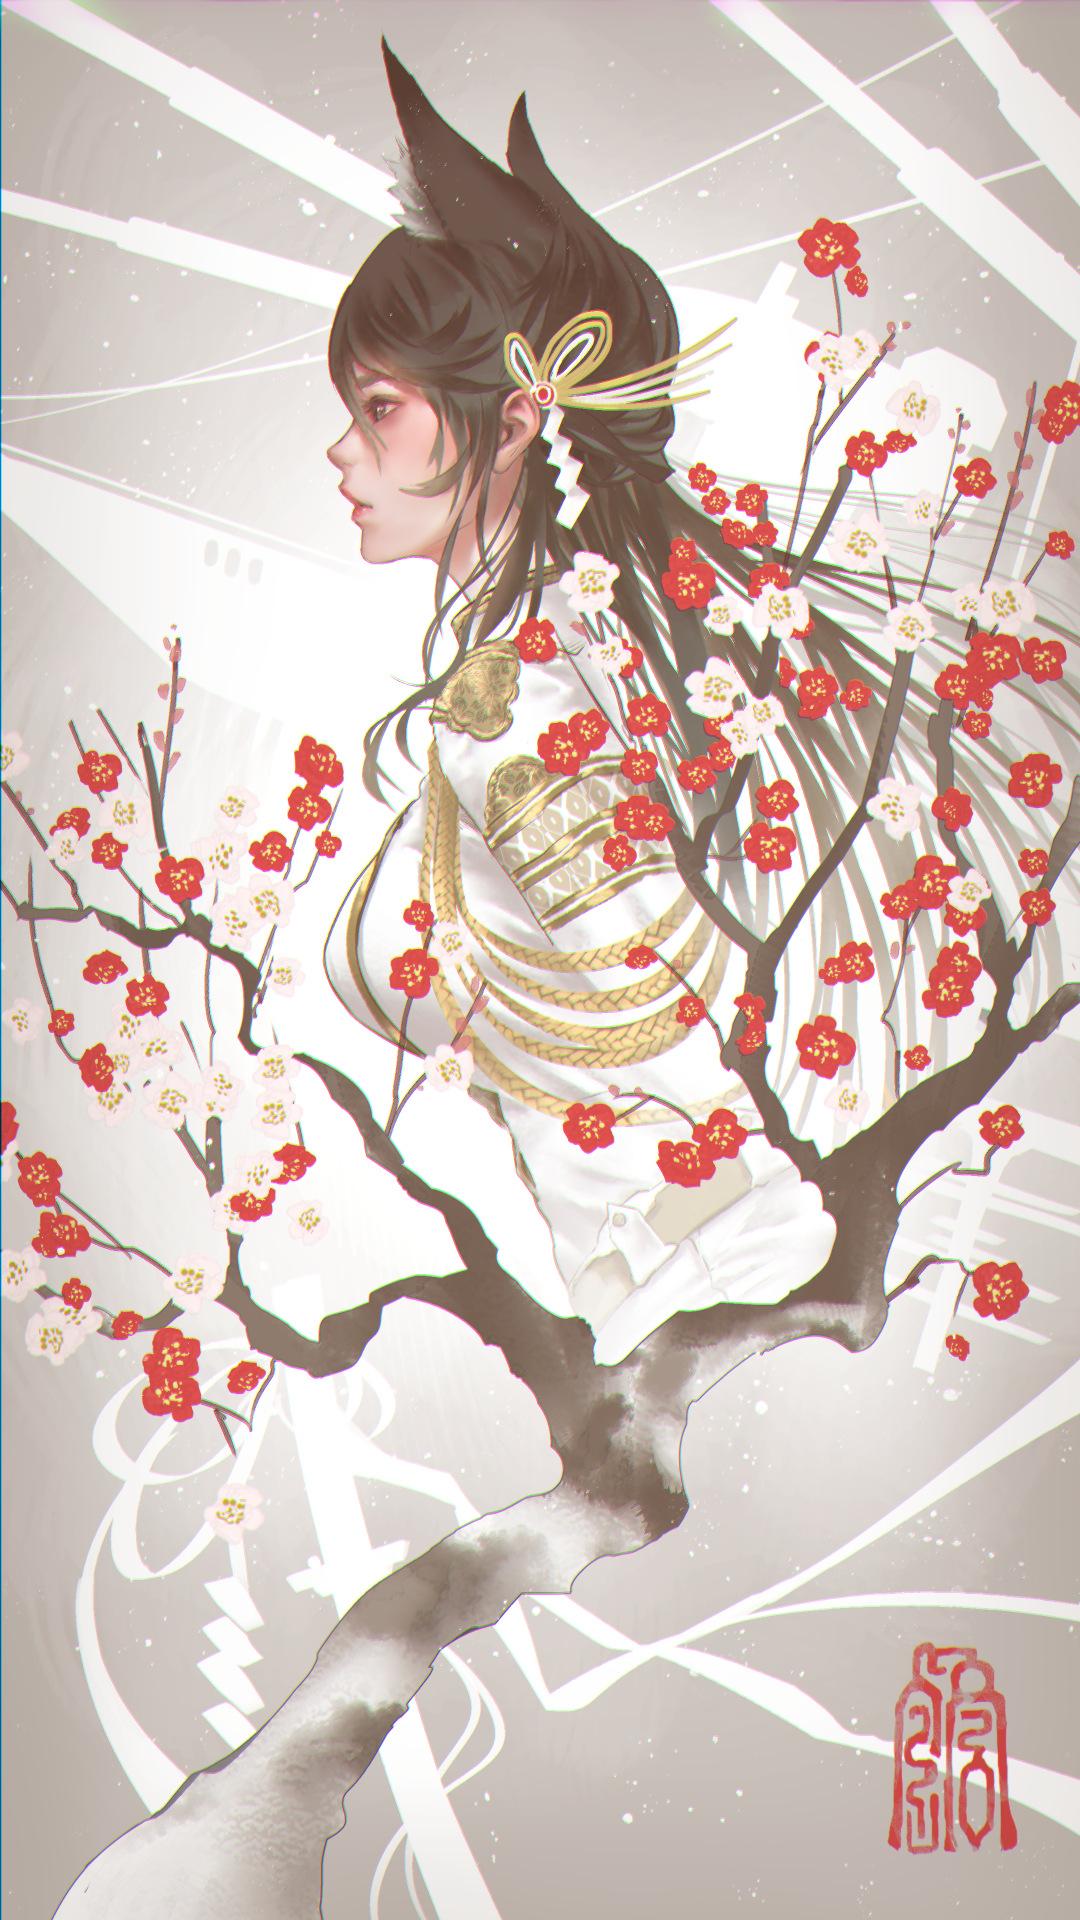 Anime 1080x1920 Atago (Azur Lane) Azur Lane women brunette long hair profile fox girl foxy ears animal ears Military Uniform branch cherry blossom fan art anime girls fantasy girl fantasy art artwork digital art drawing illustration 2D painting digital painting Kaburagi Yasutaka